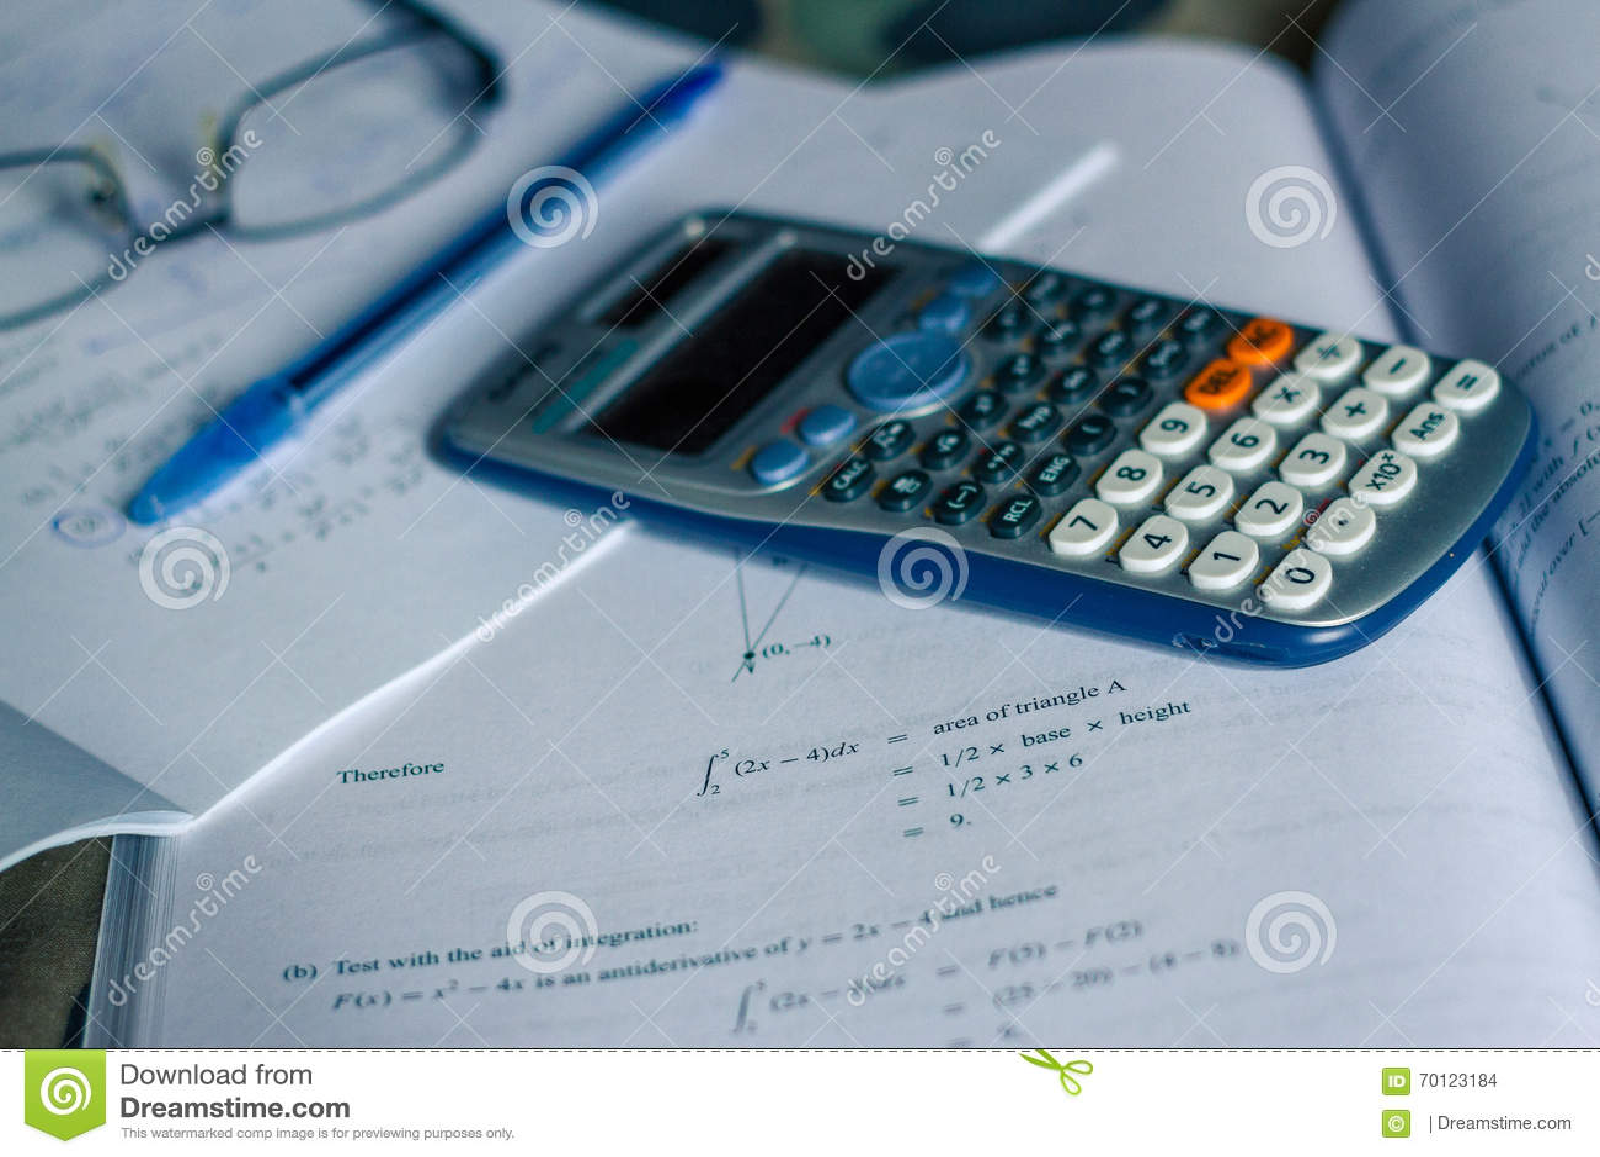 Integral Calculus Stock Photo - Image: 70123184